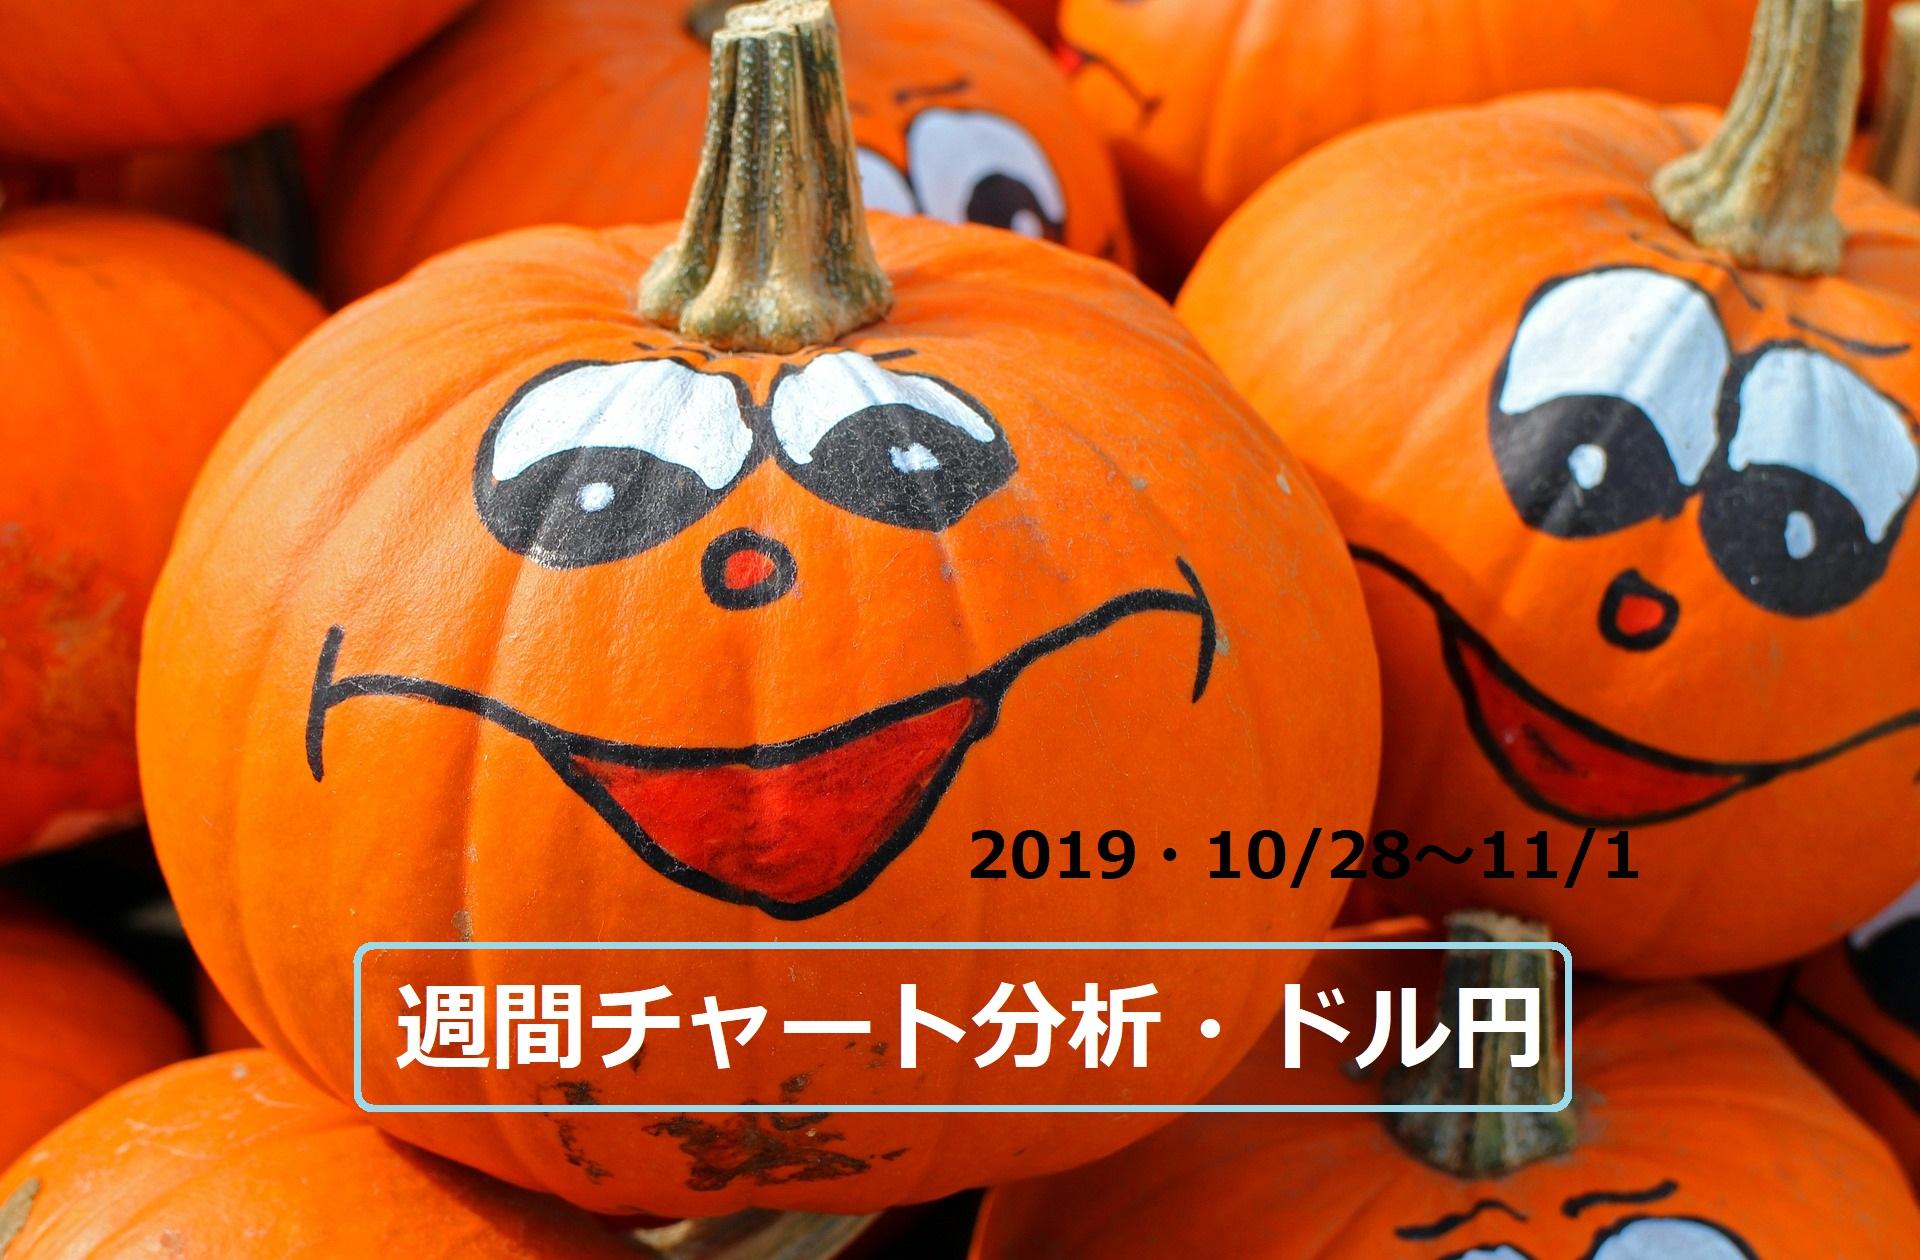 【FX】週間チャート分析・ドル円【2019・10/28~11/1】